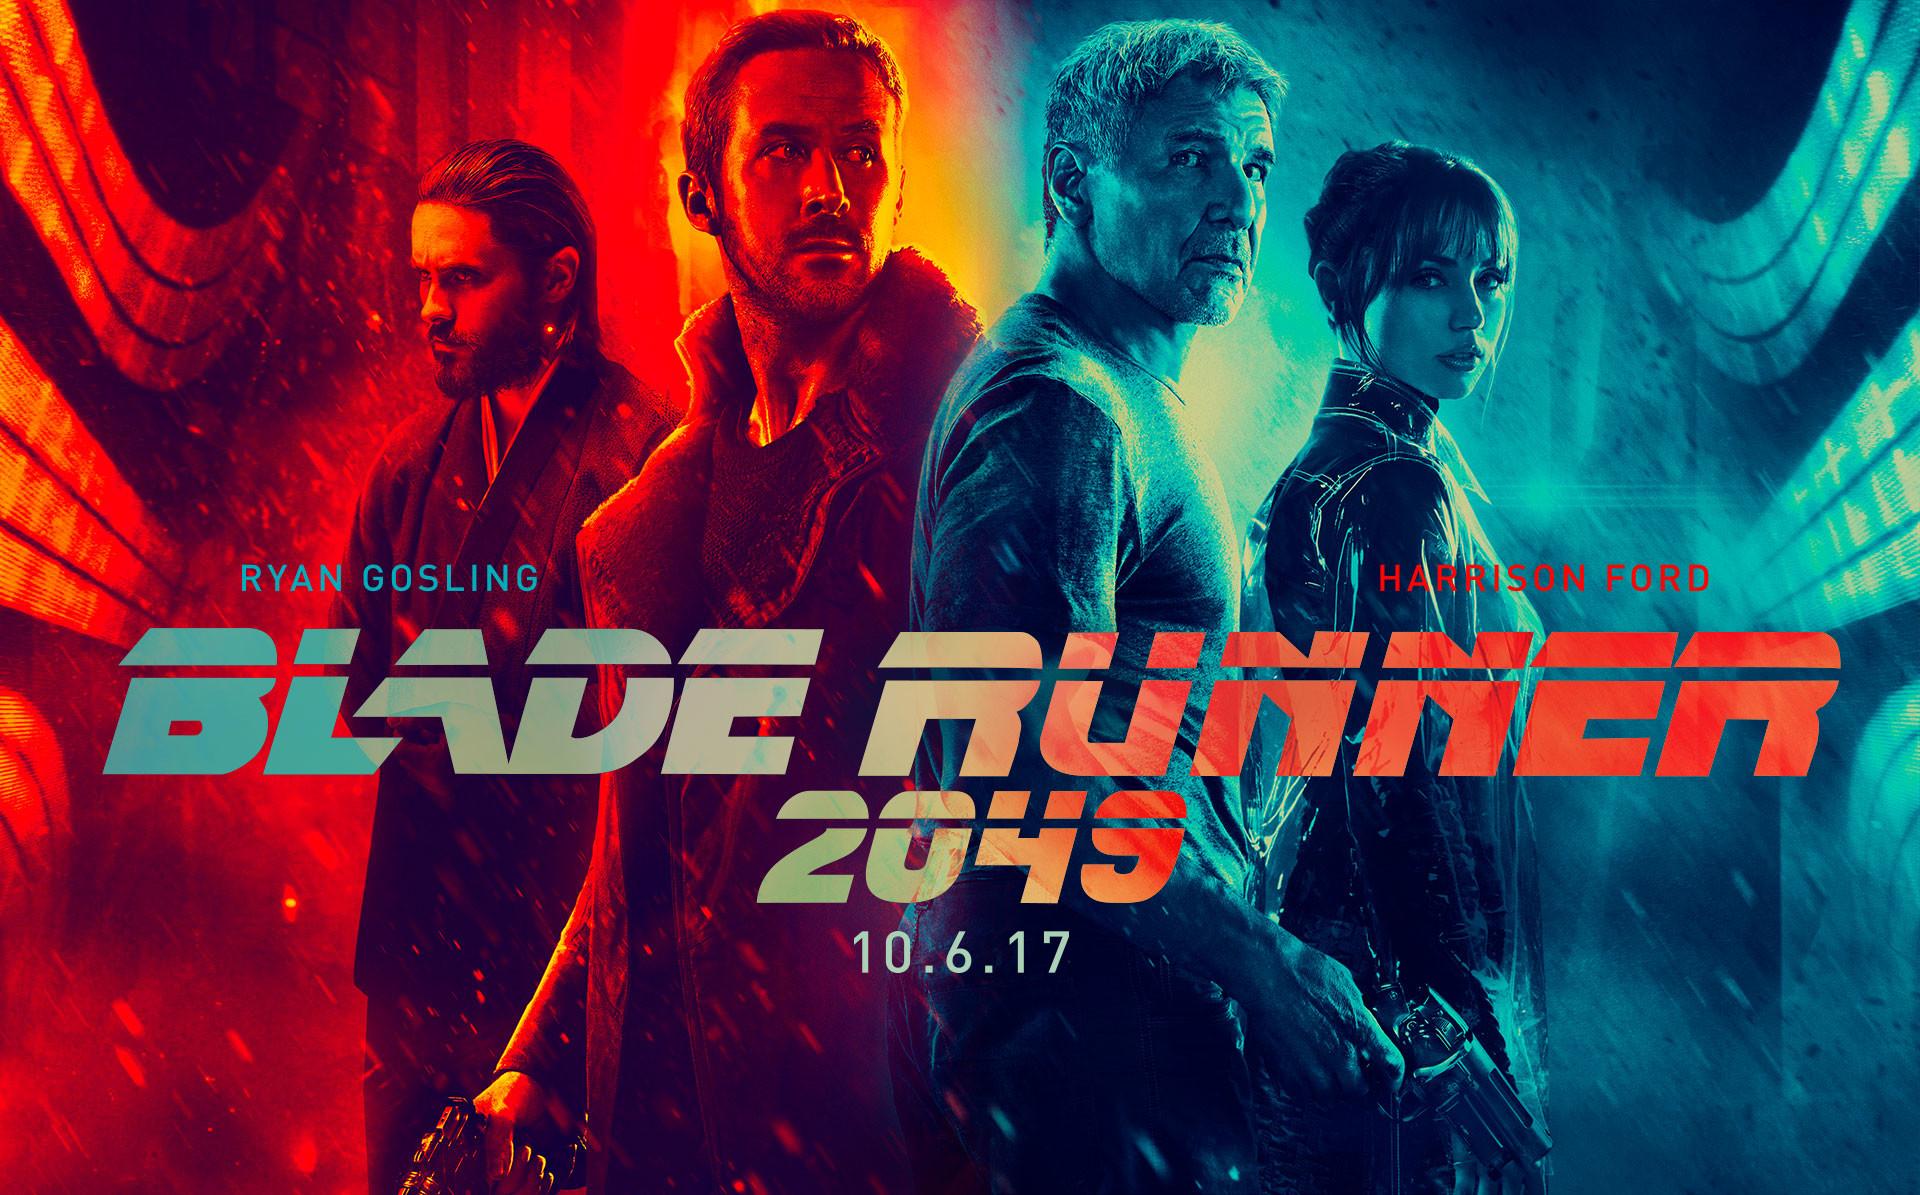 Movie – Blade Runner 2049 Neon Harrison Ford Ryan Gosling Ana de Armas  Jared Leto Wallpaper